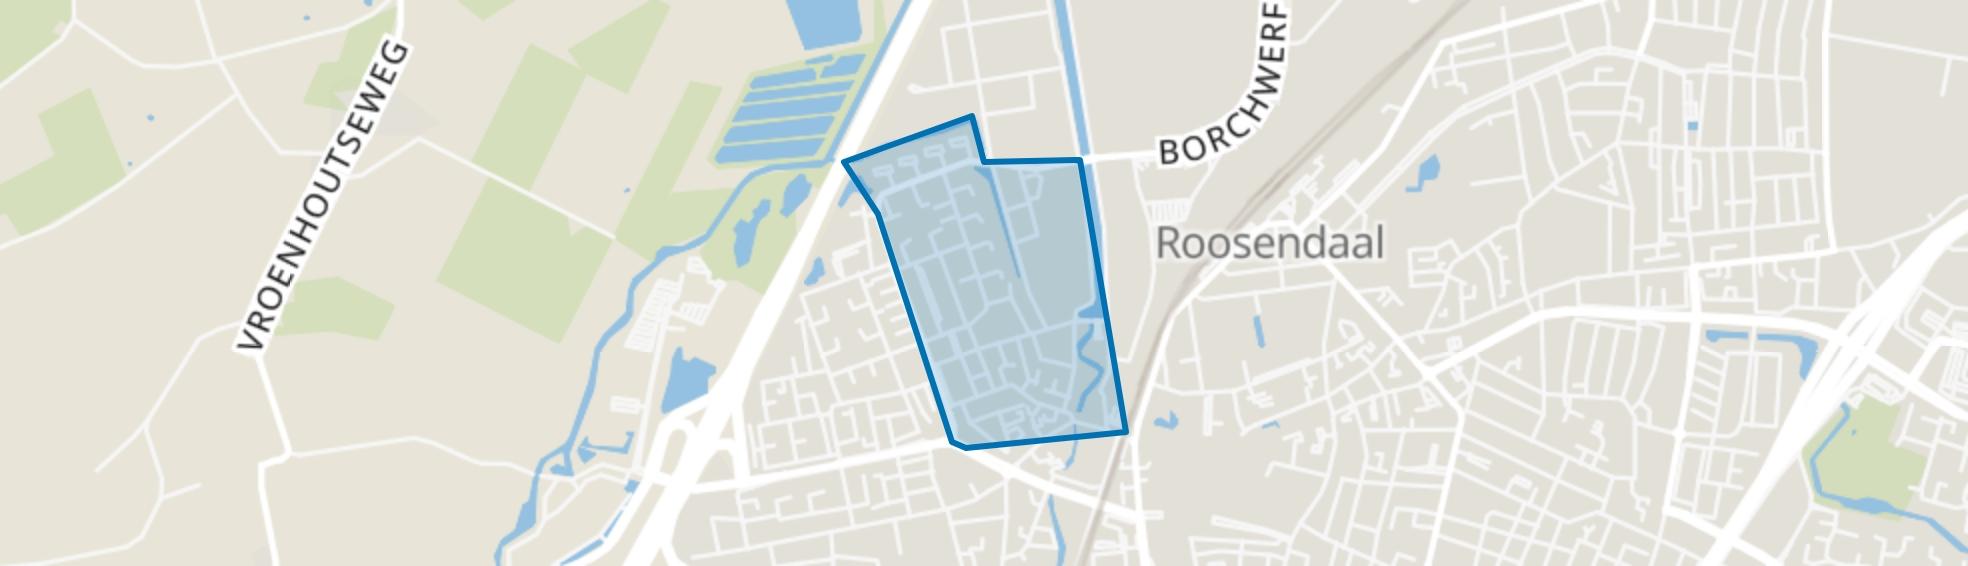 Scherpdeel, Roosendaal map